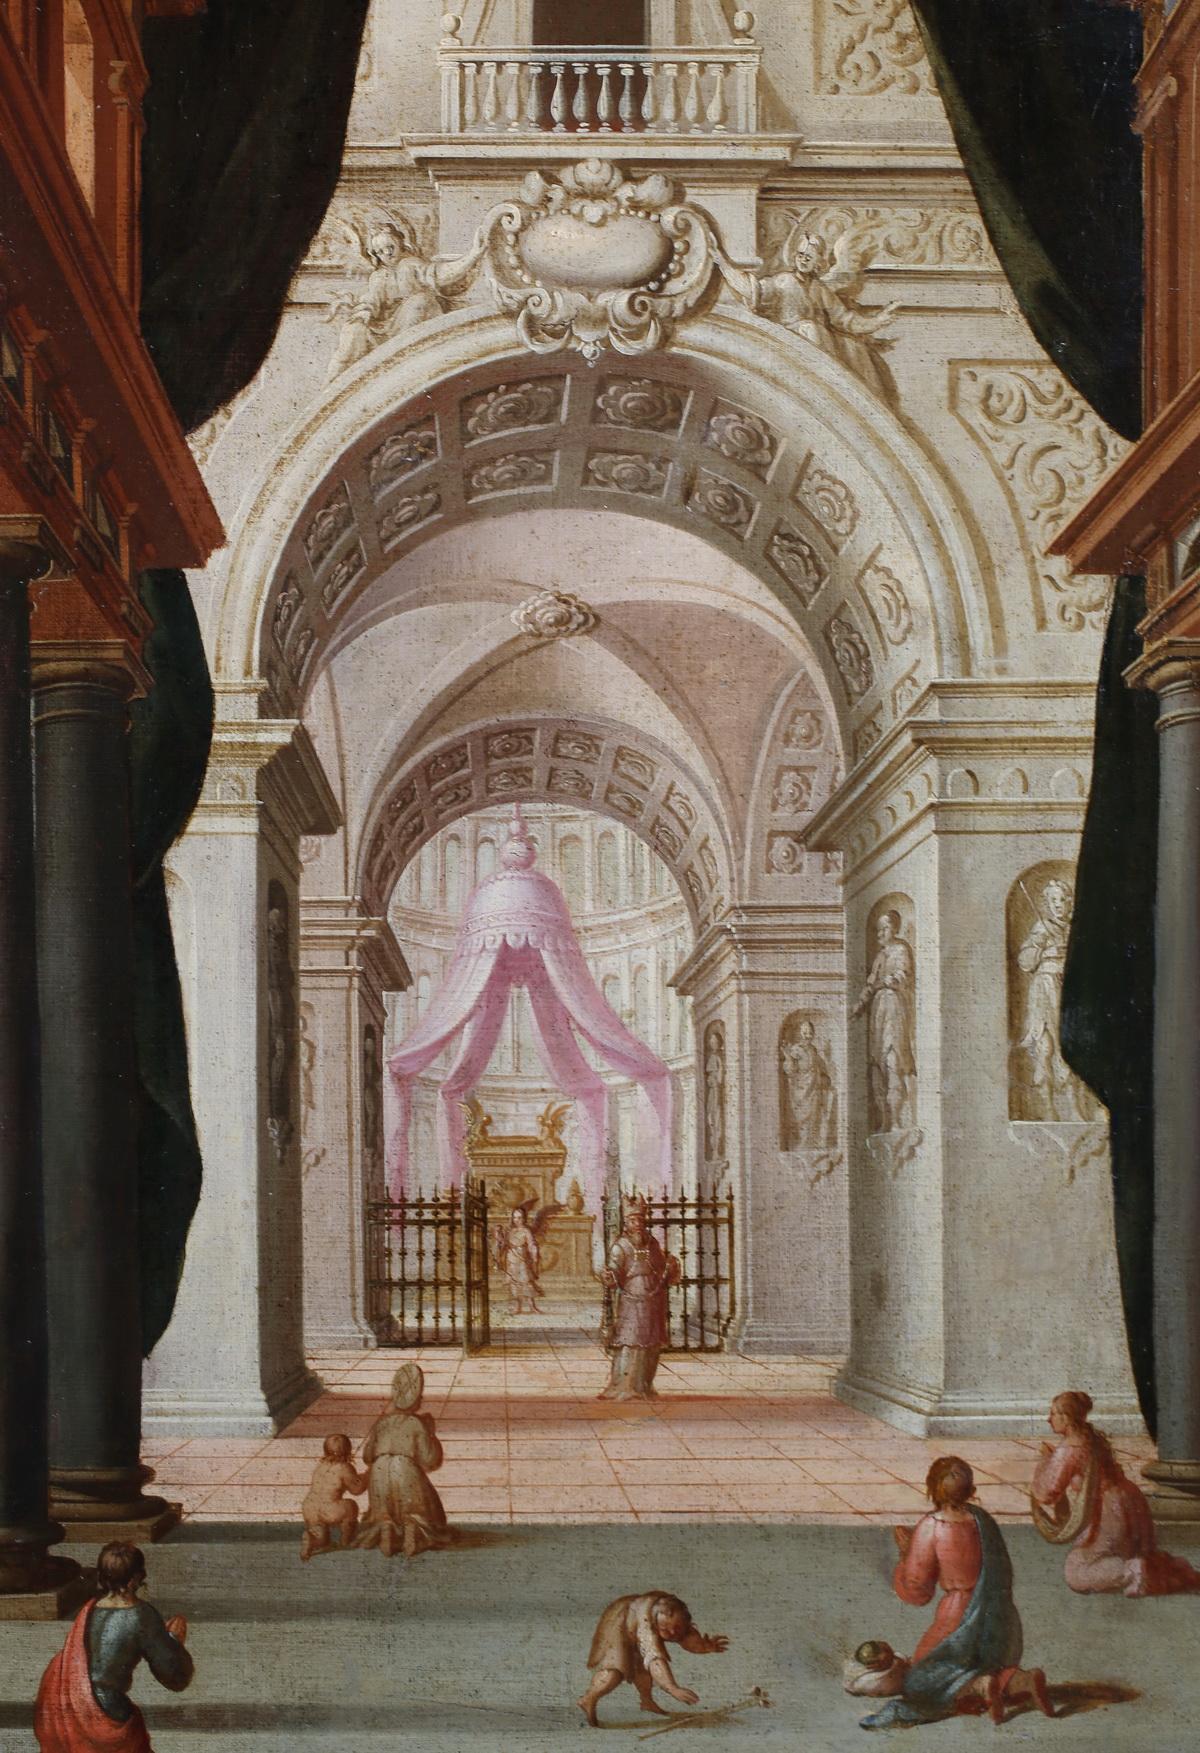 Ecole Espagnole du XVIIIème